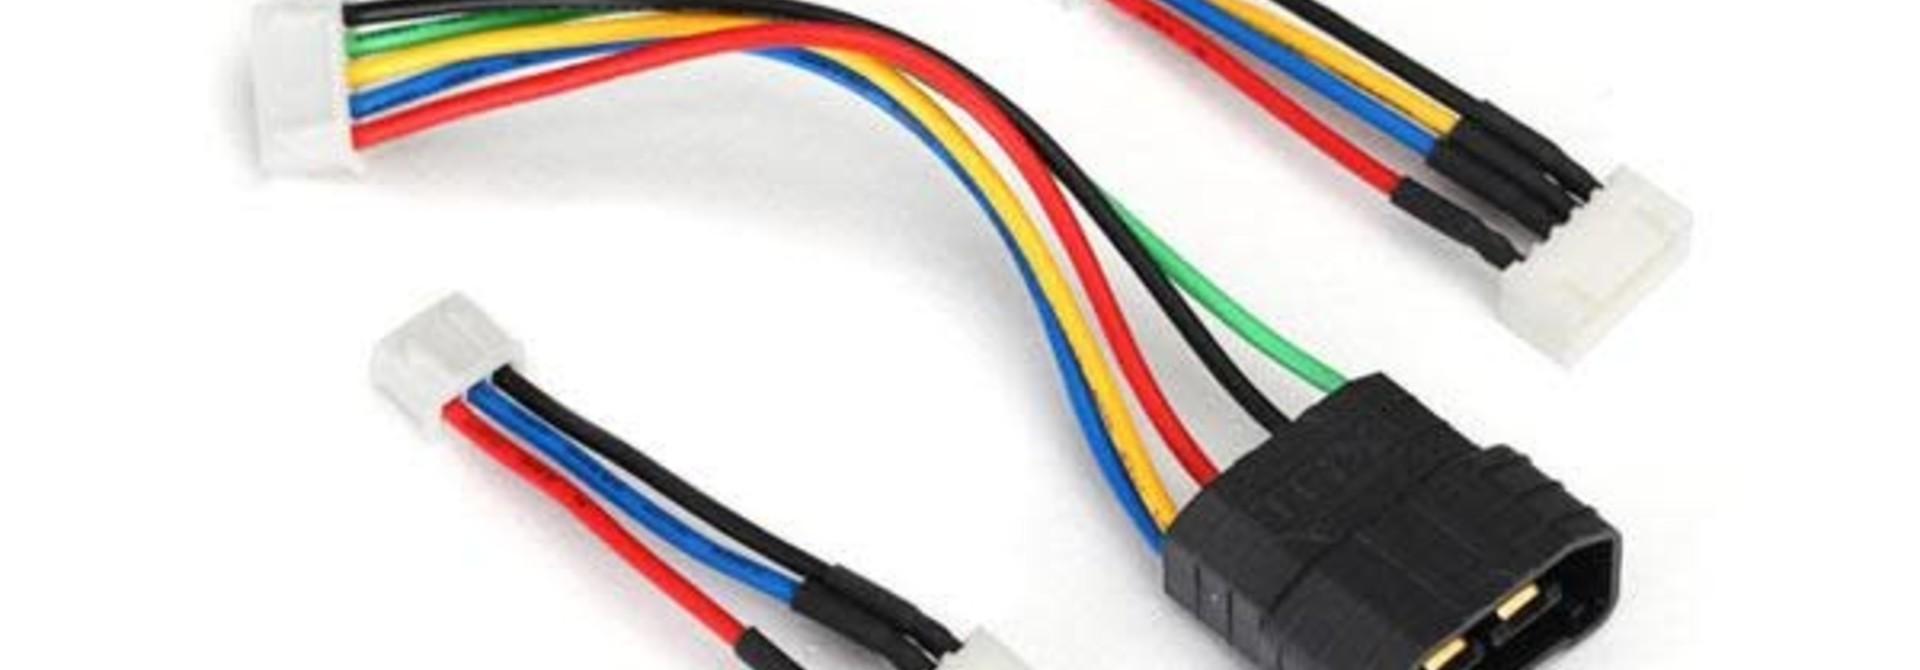 Adapter, Traxxas iD LiPo battery (adapts Traxxas iD batterie, #TRX2938X